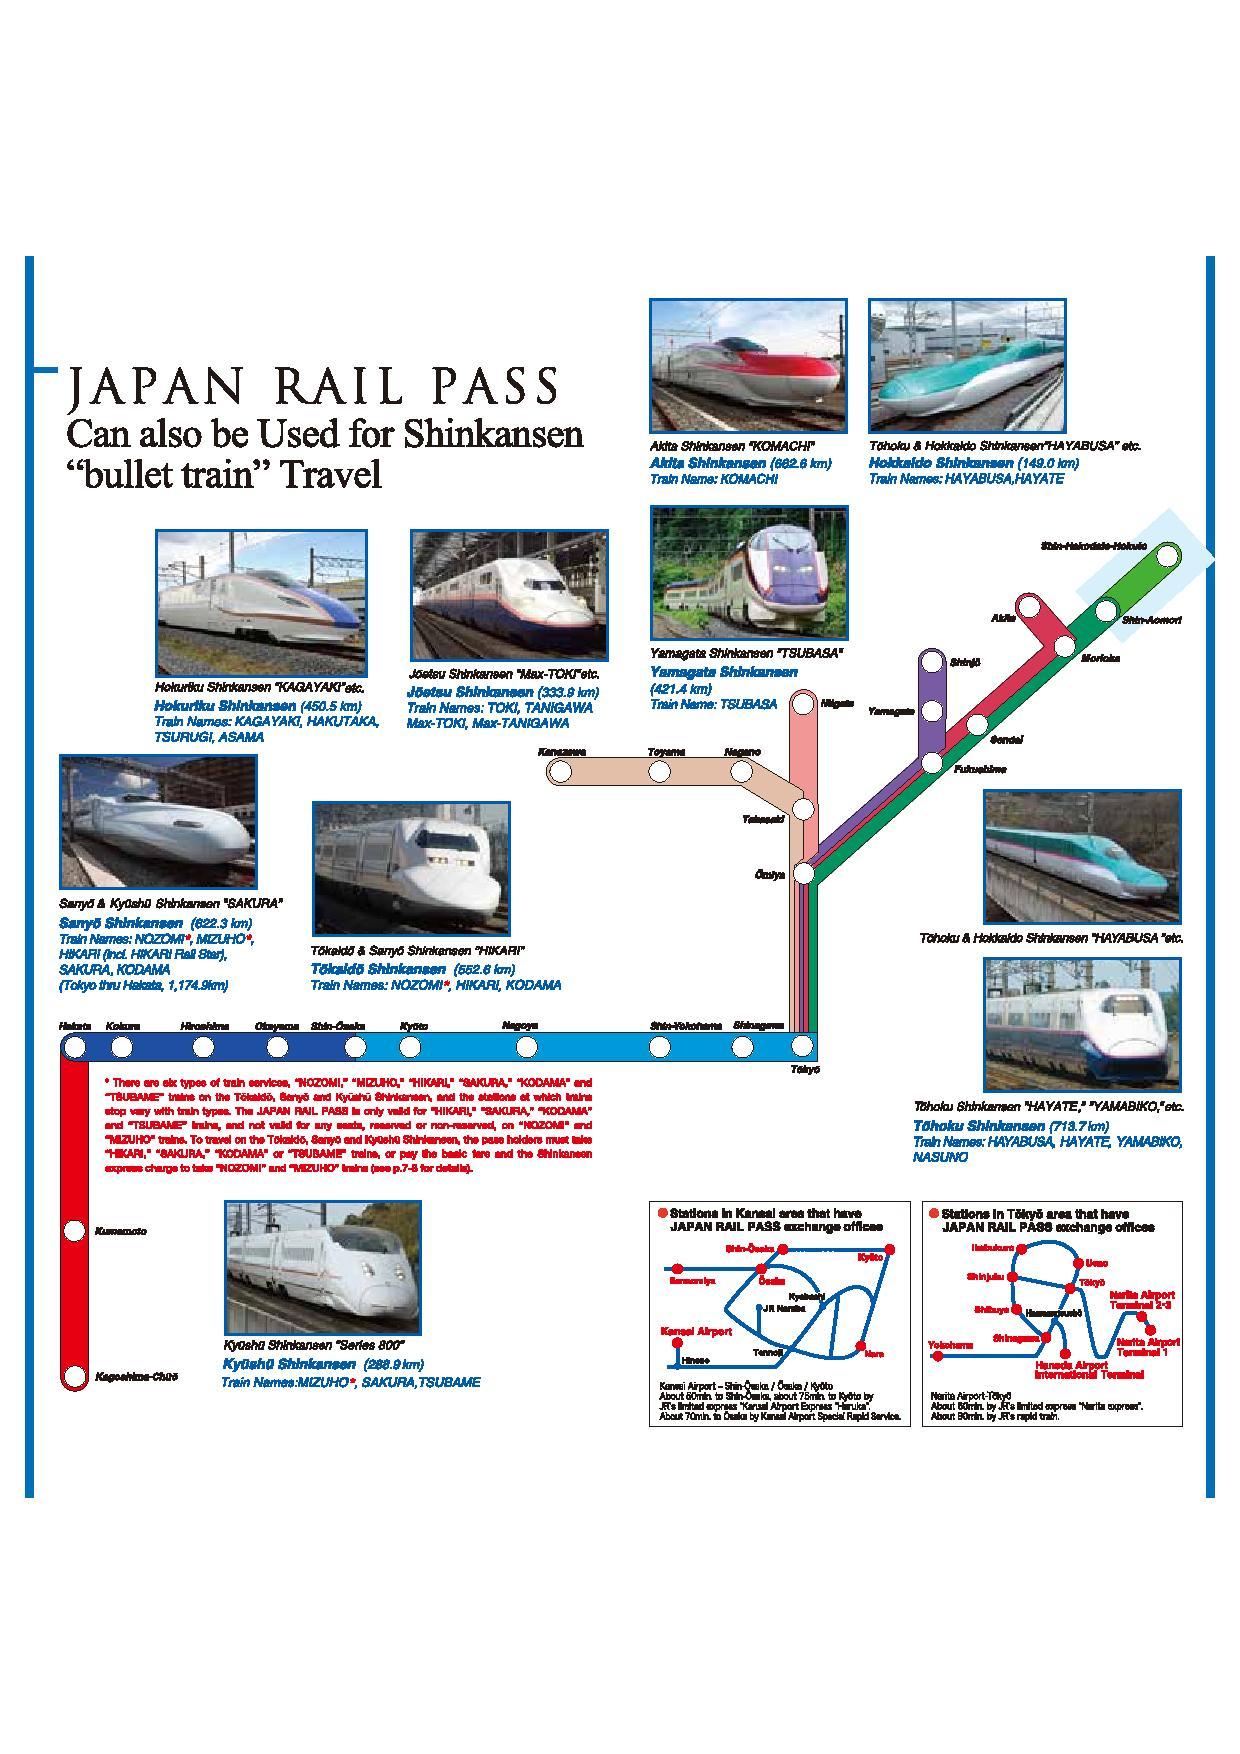 Japan Rail - FAQs : Japan Rail Pass Online, Japan Rail Pass is